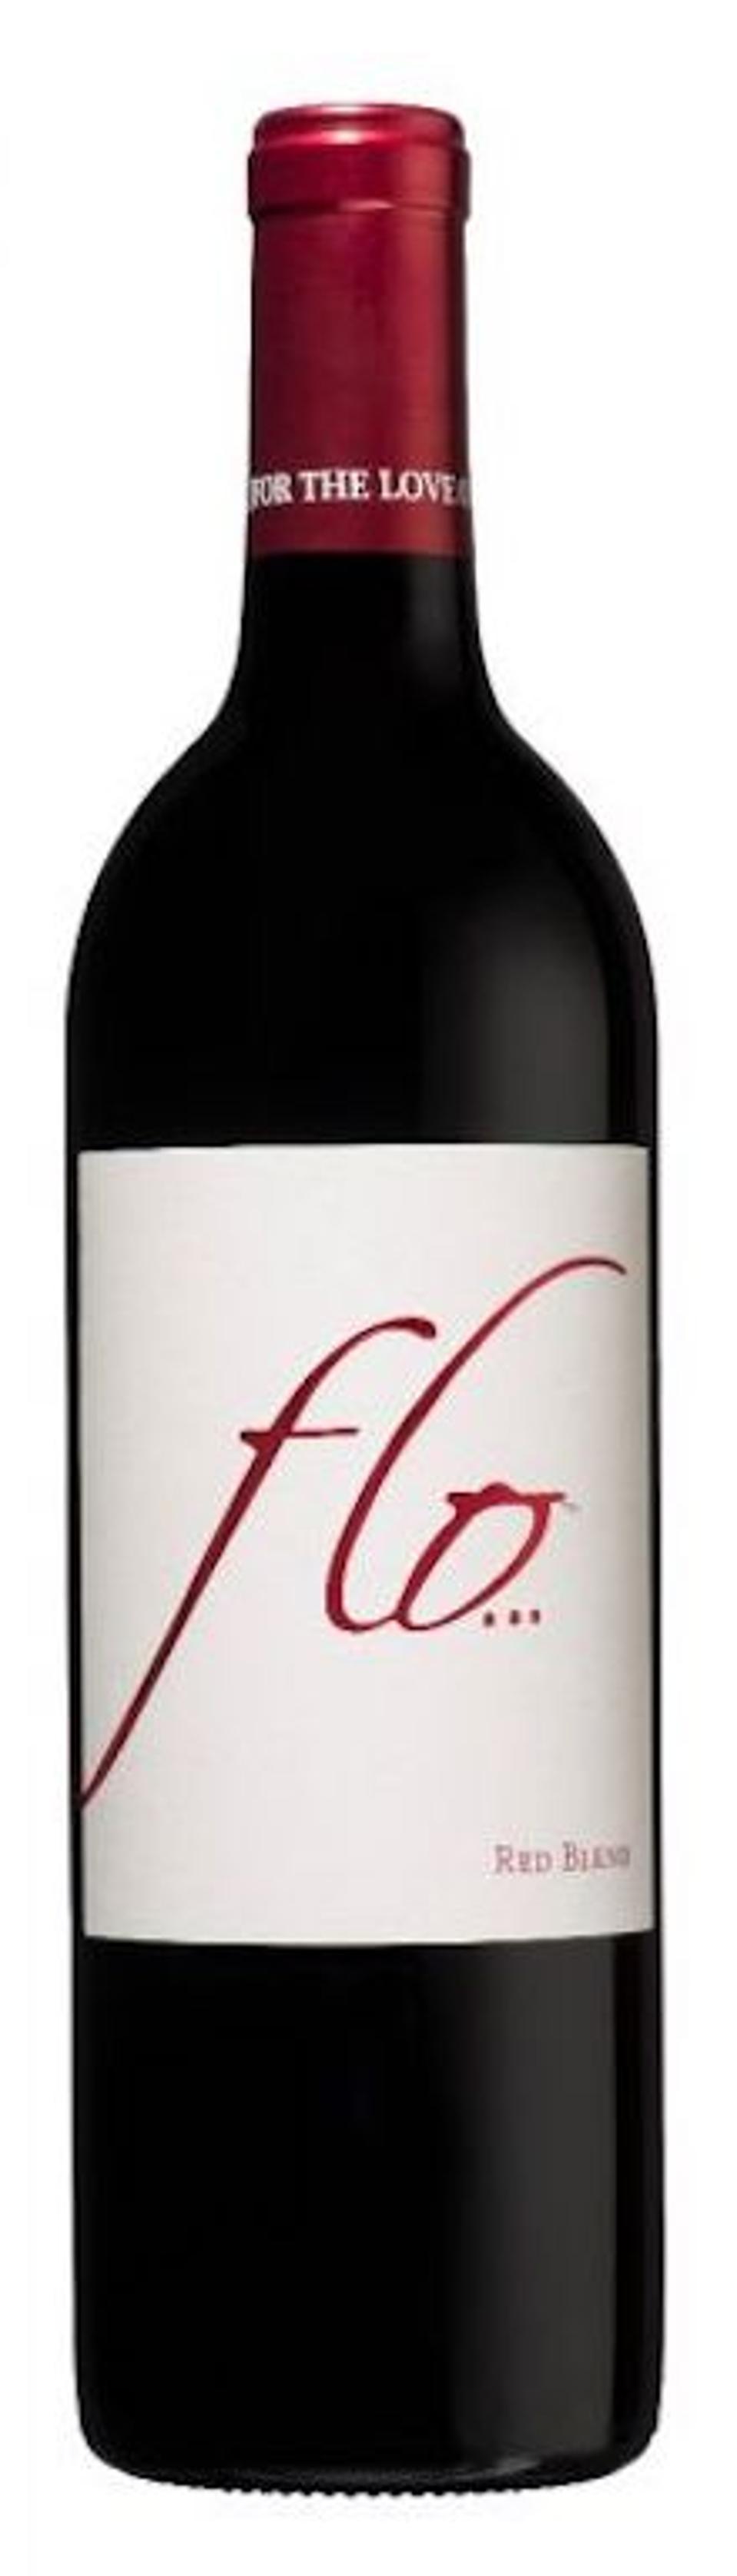 FLO Wine 2015 Red Blend